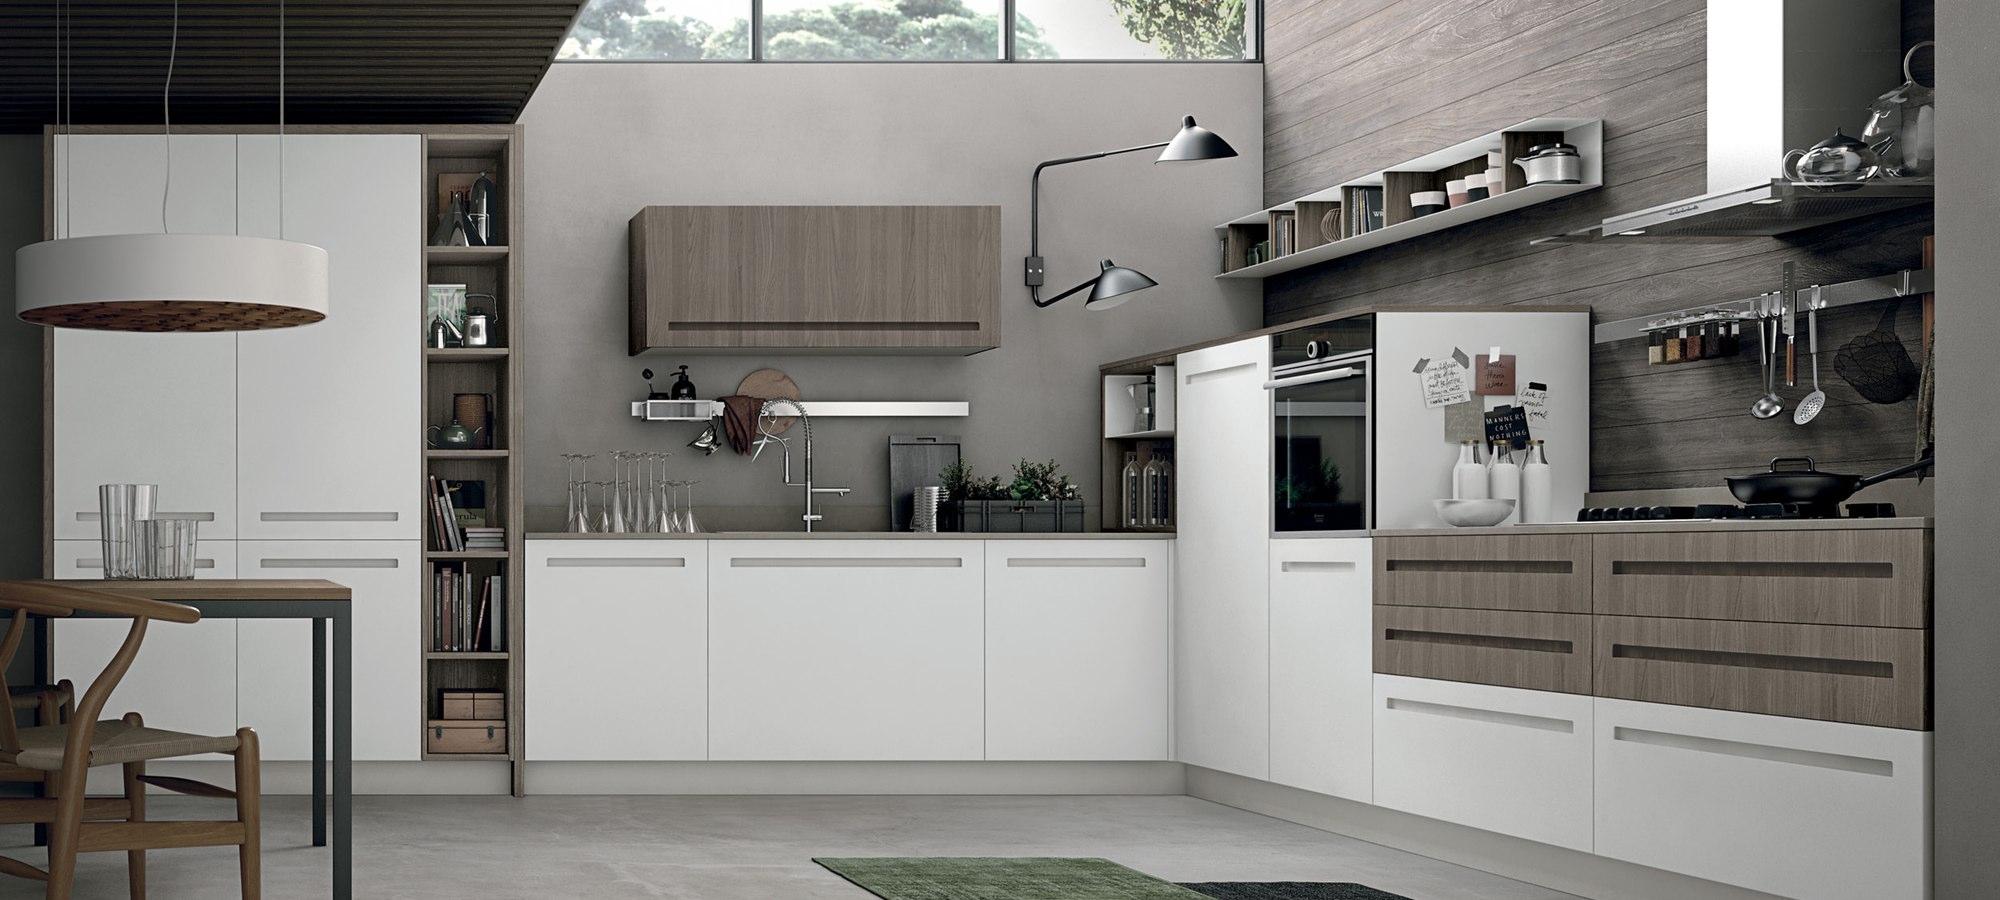 Stunning Cucina Composizione Tipo Gallery - Ridgewayng.com ...